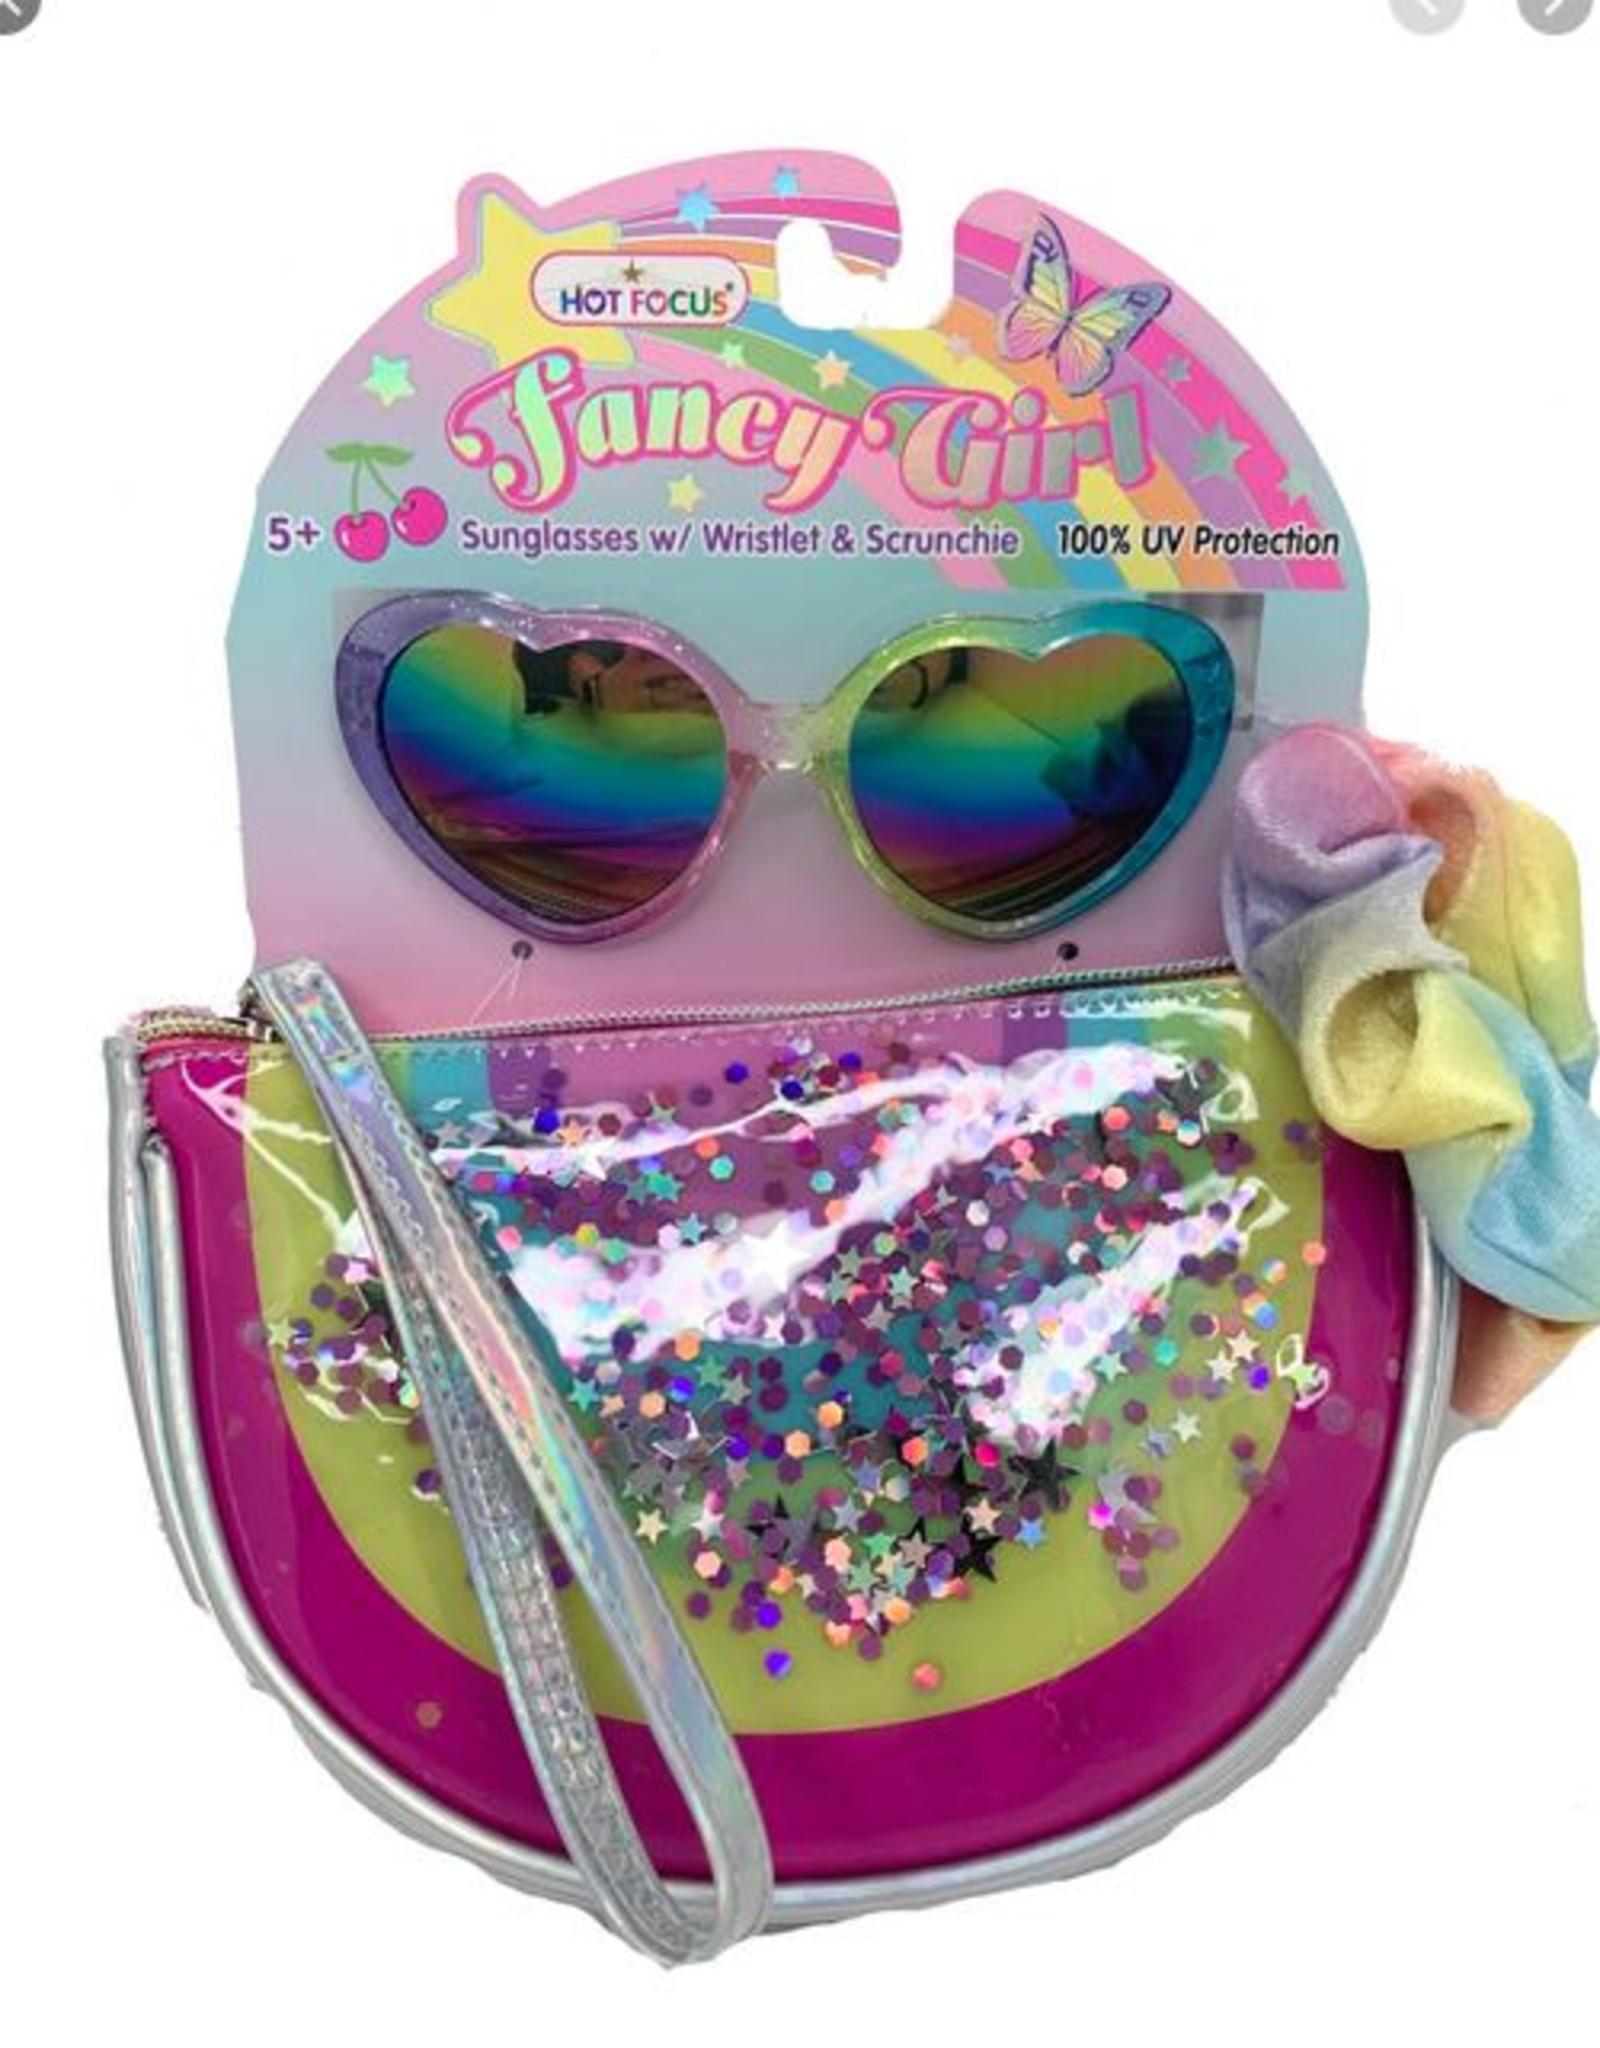 Hot Focus Fancy Girl Sunglasses w/Wristlet & Scrunchie, Rainbow